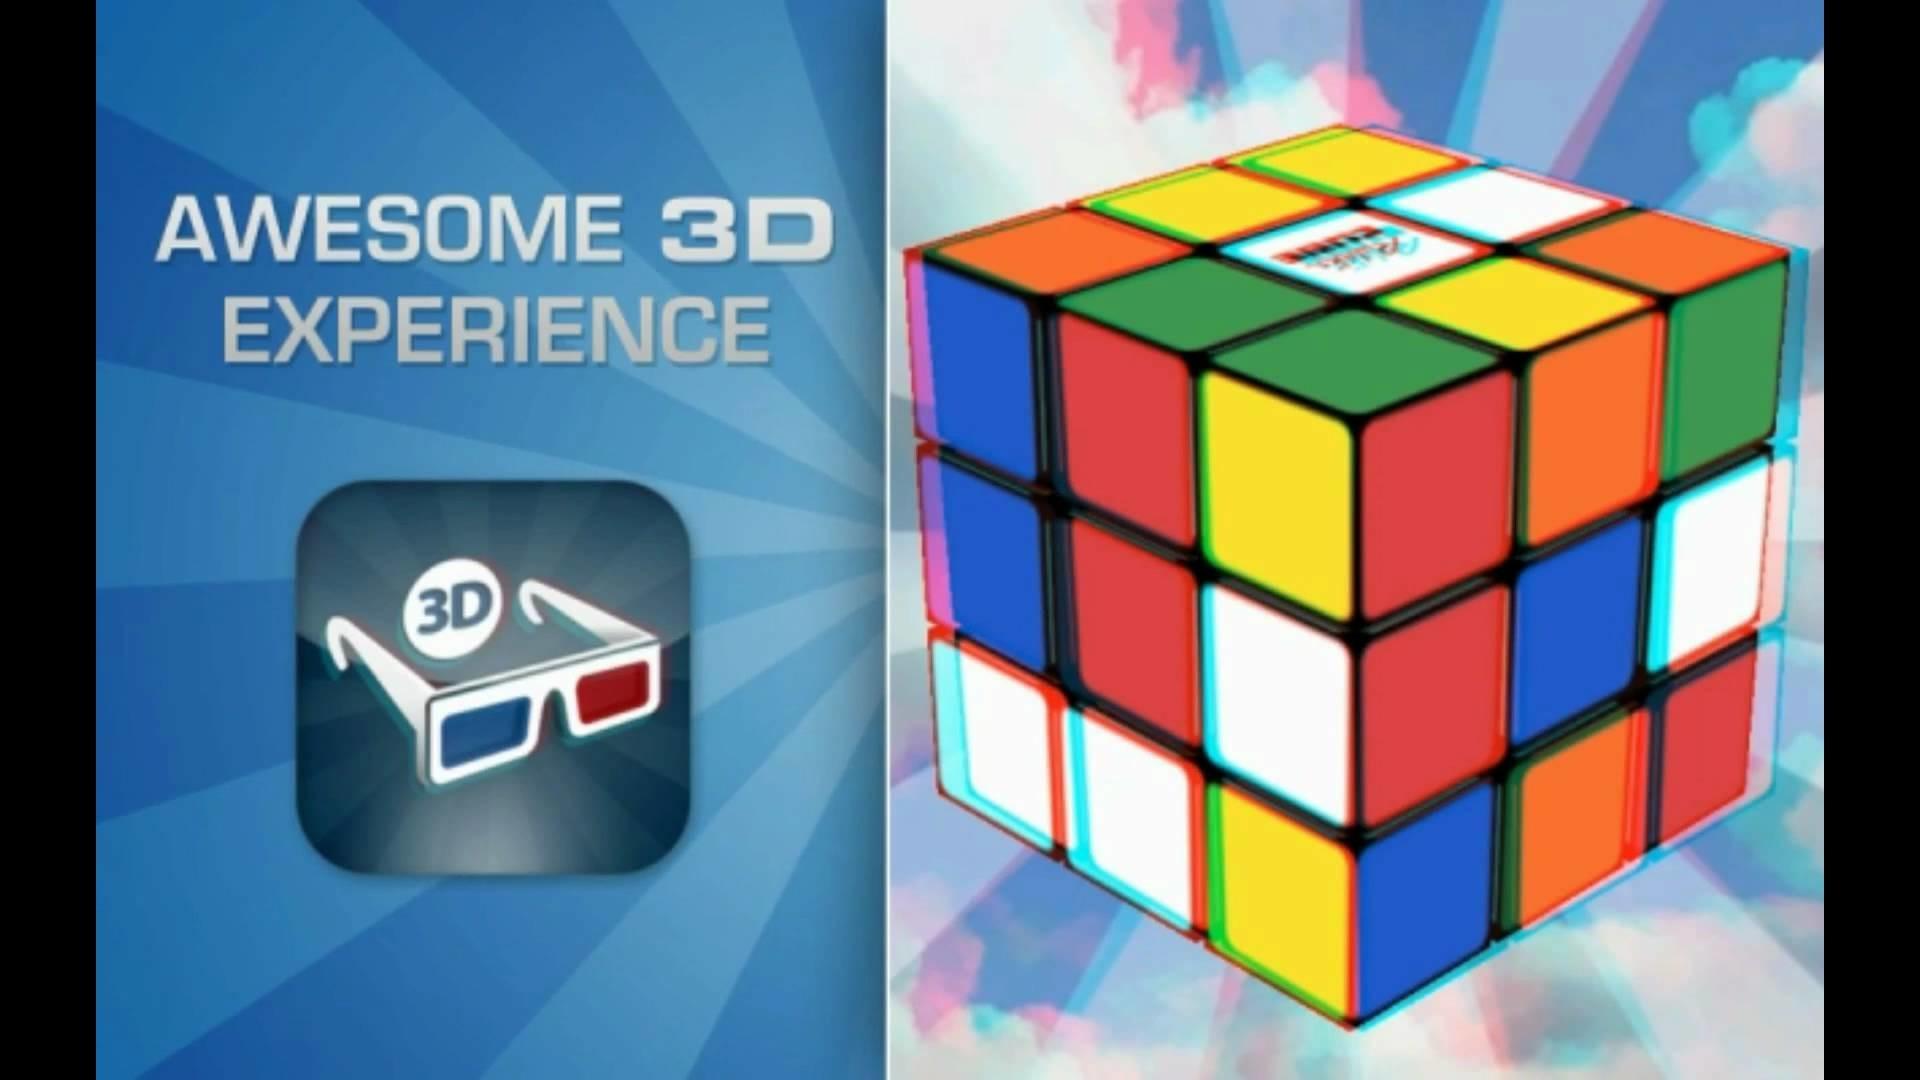 Rubik's Cube for iPad, iPhone, or iPod